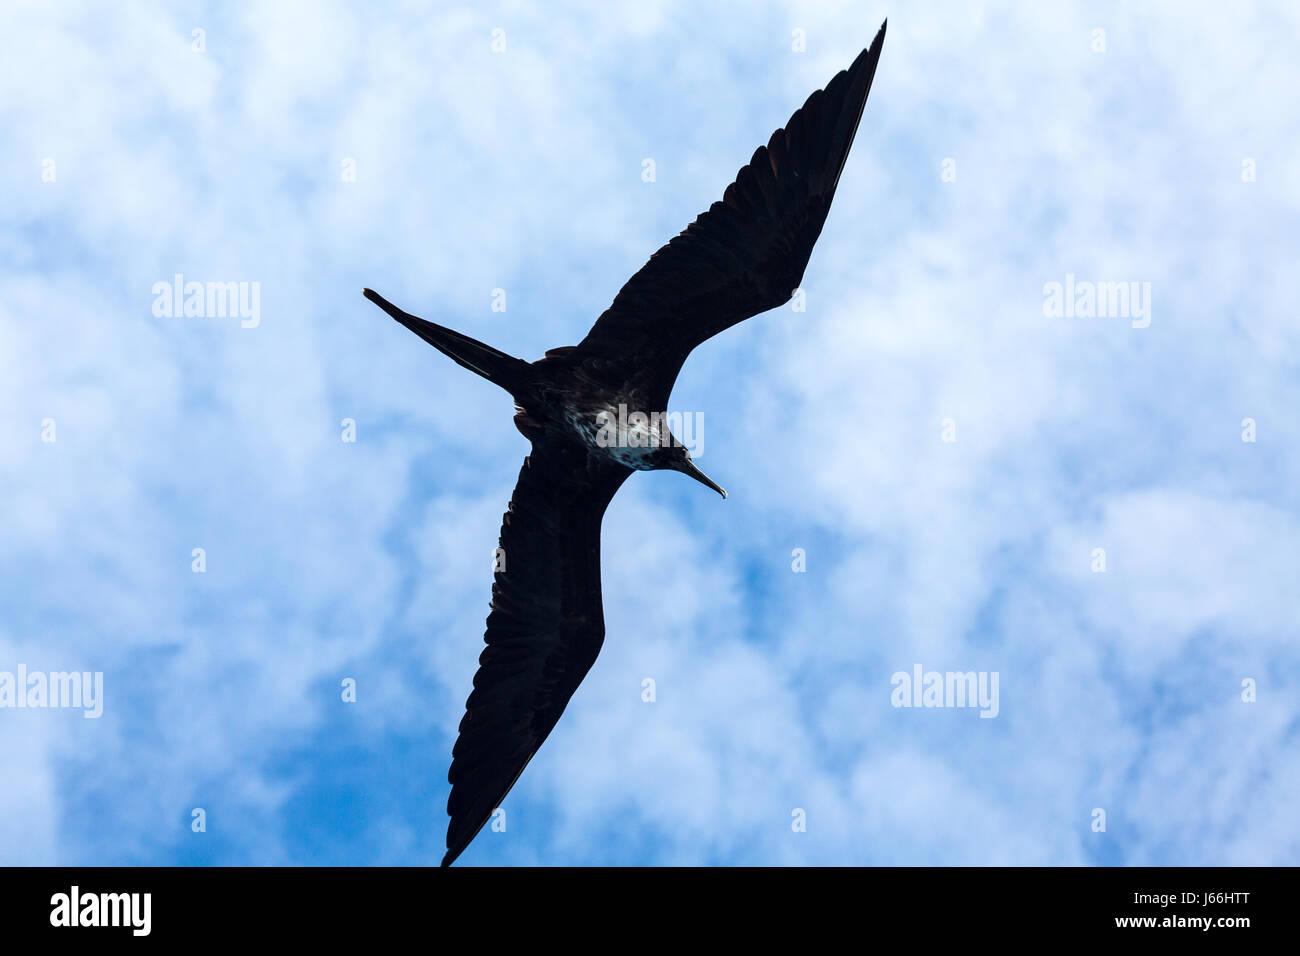 Magnificent frigate bird soaring overhead - Stock Image